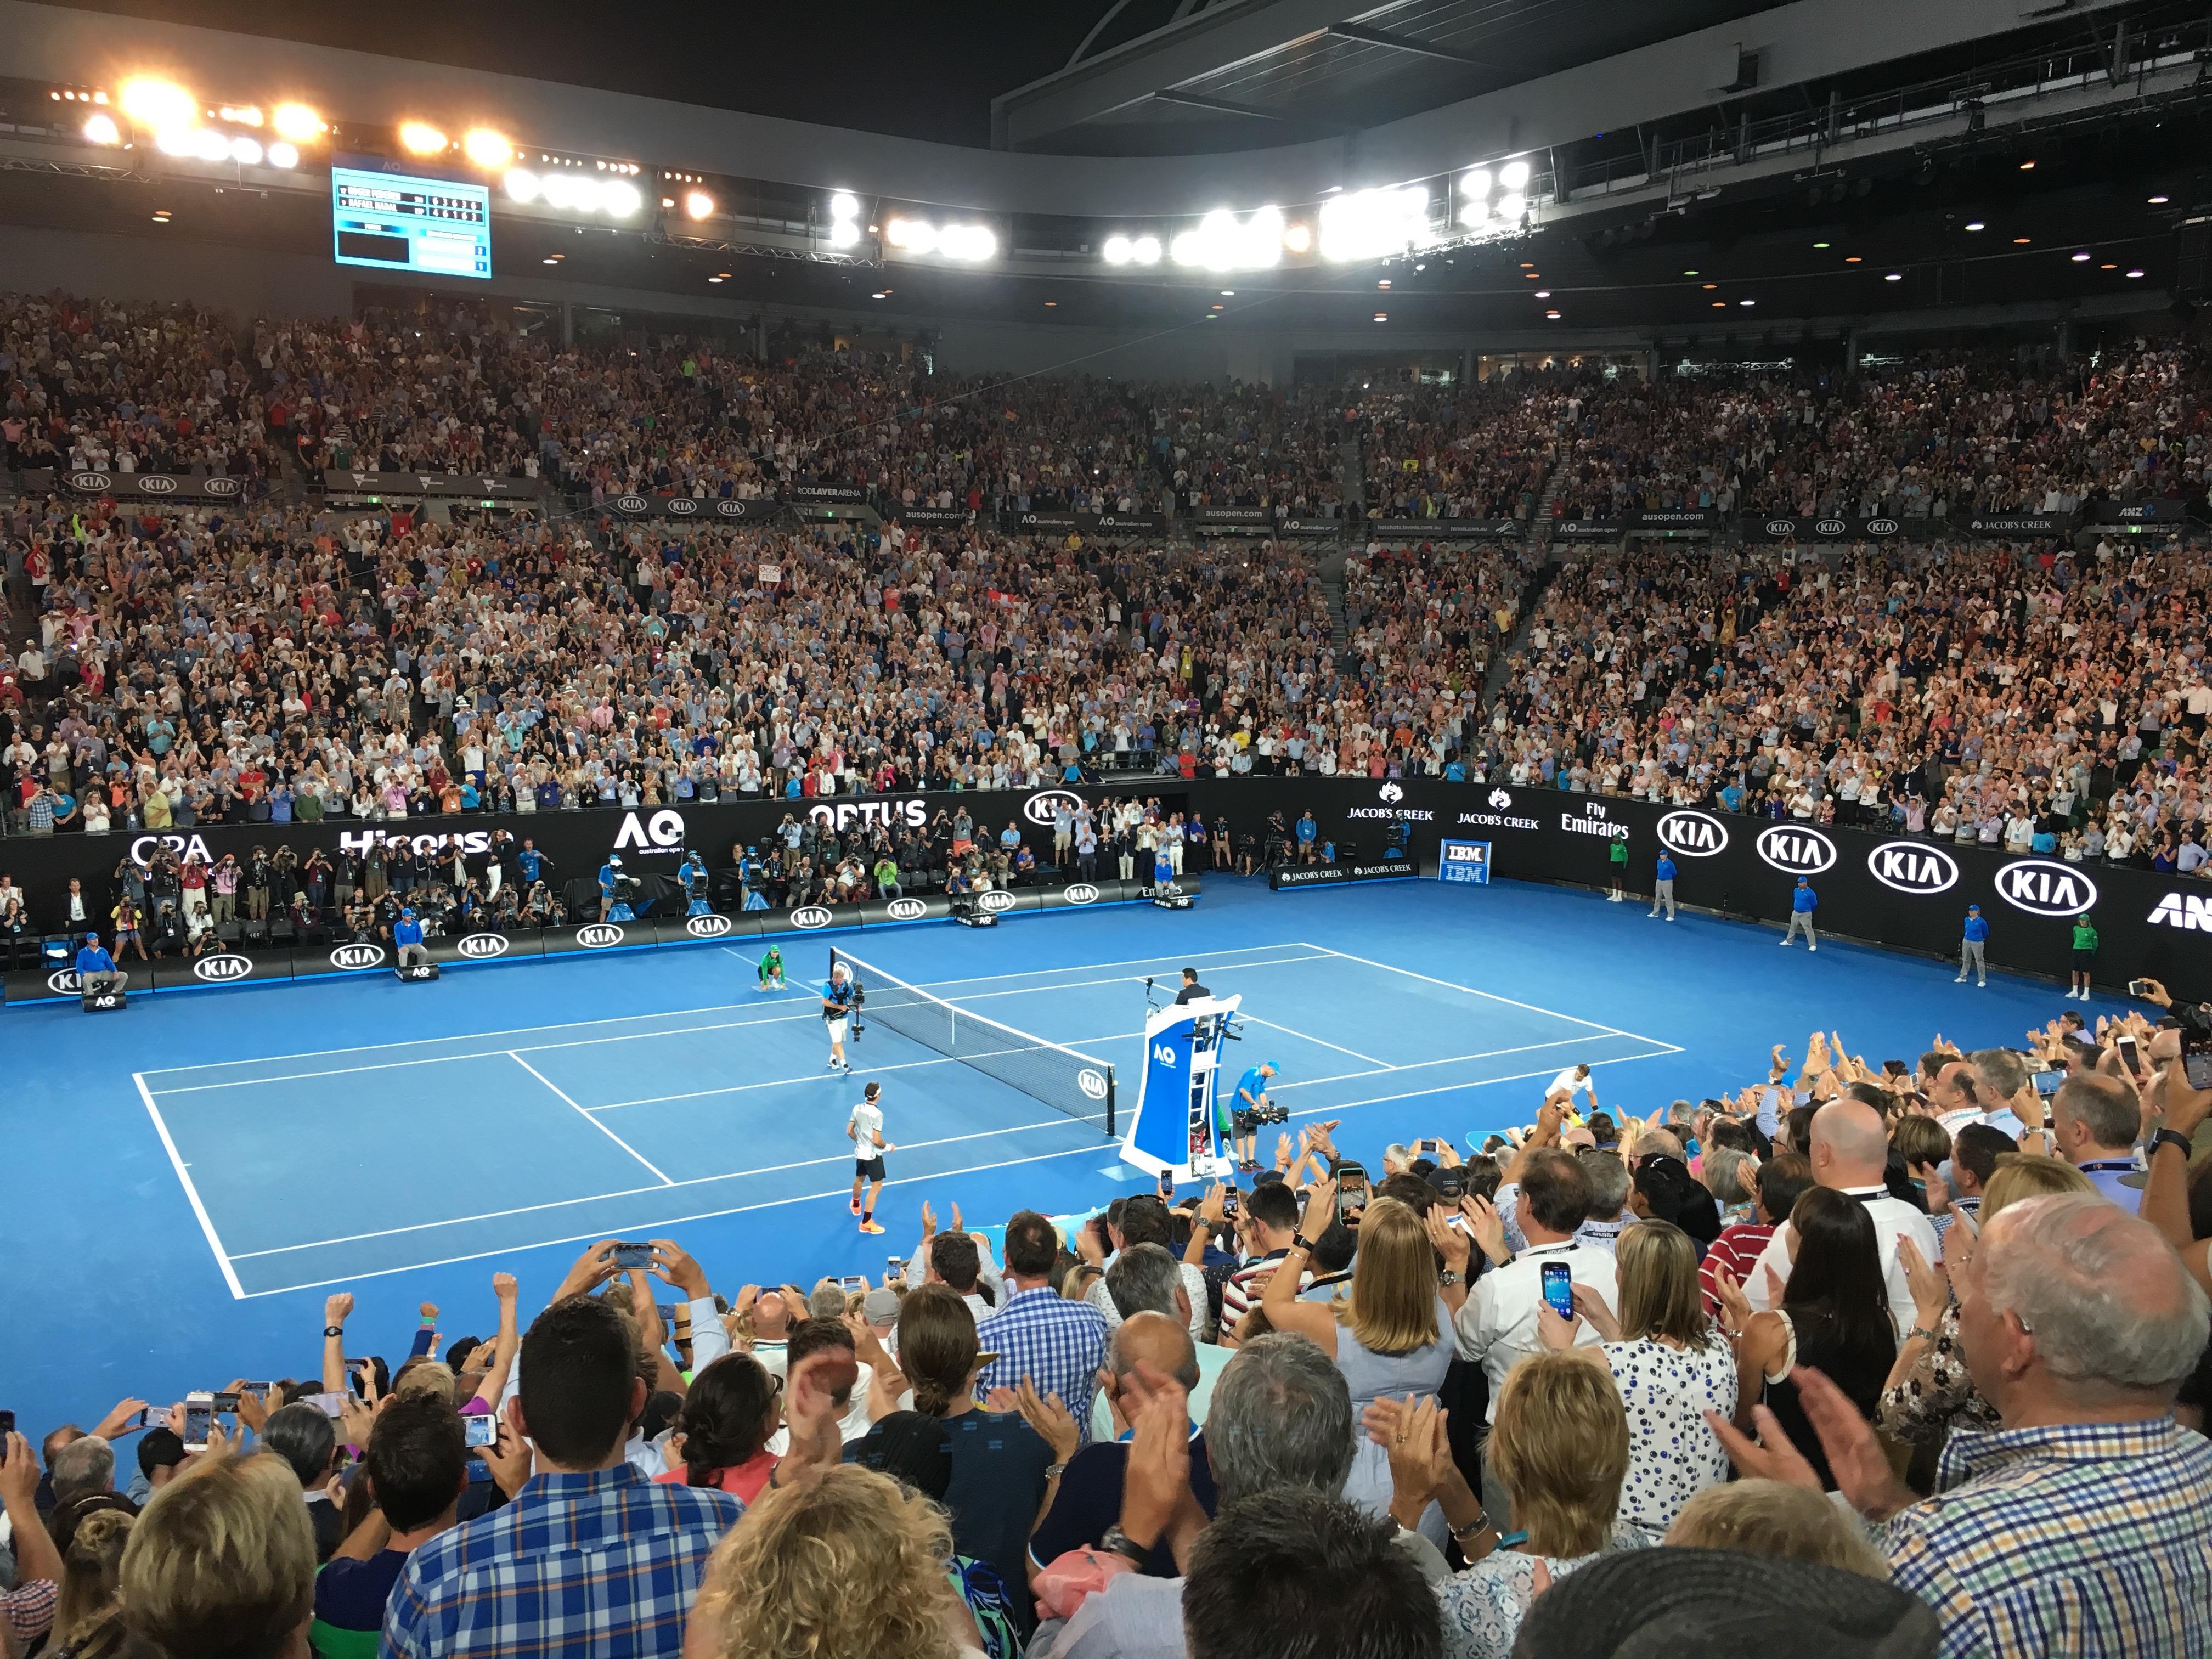 teniski-promeni-ao-so-chasovnik-od-25-sekundi-16-nositeli-od-2019